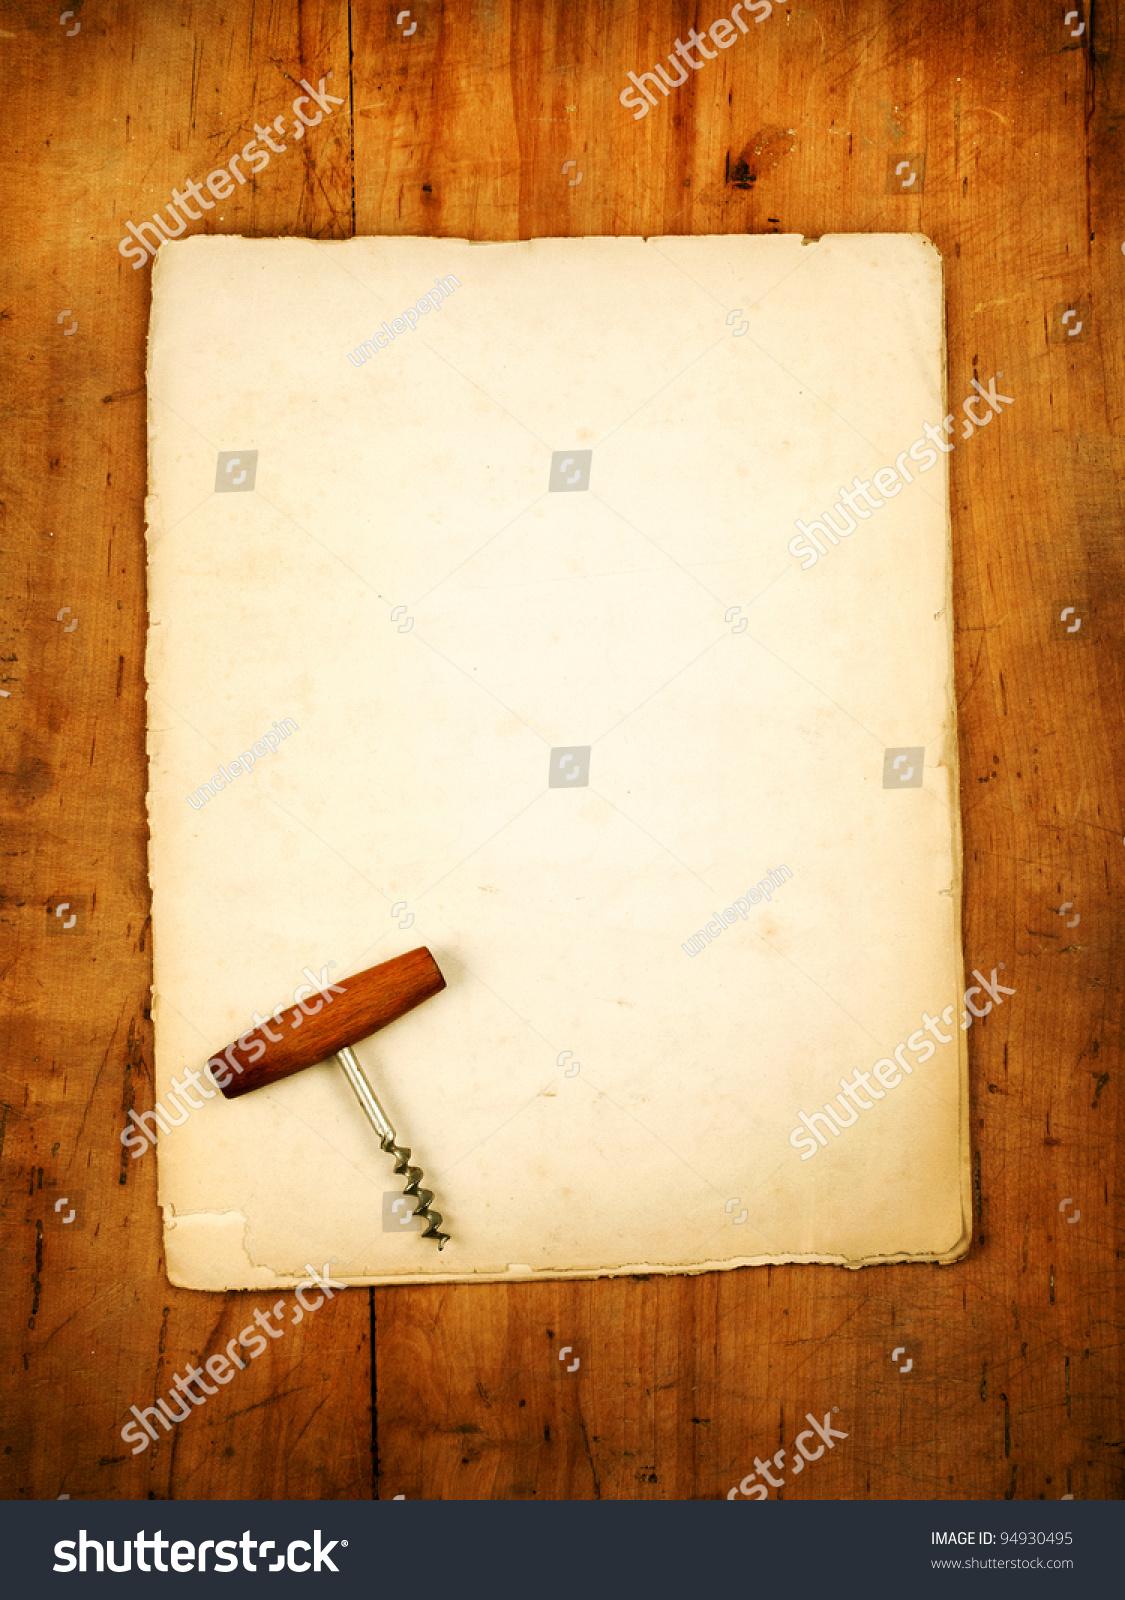 Blank Paper Menu Old Wine Opener Photo 94930495 Shutterstock – Blank Paper Background